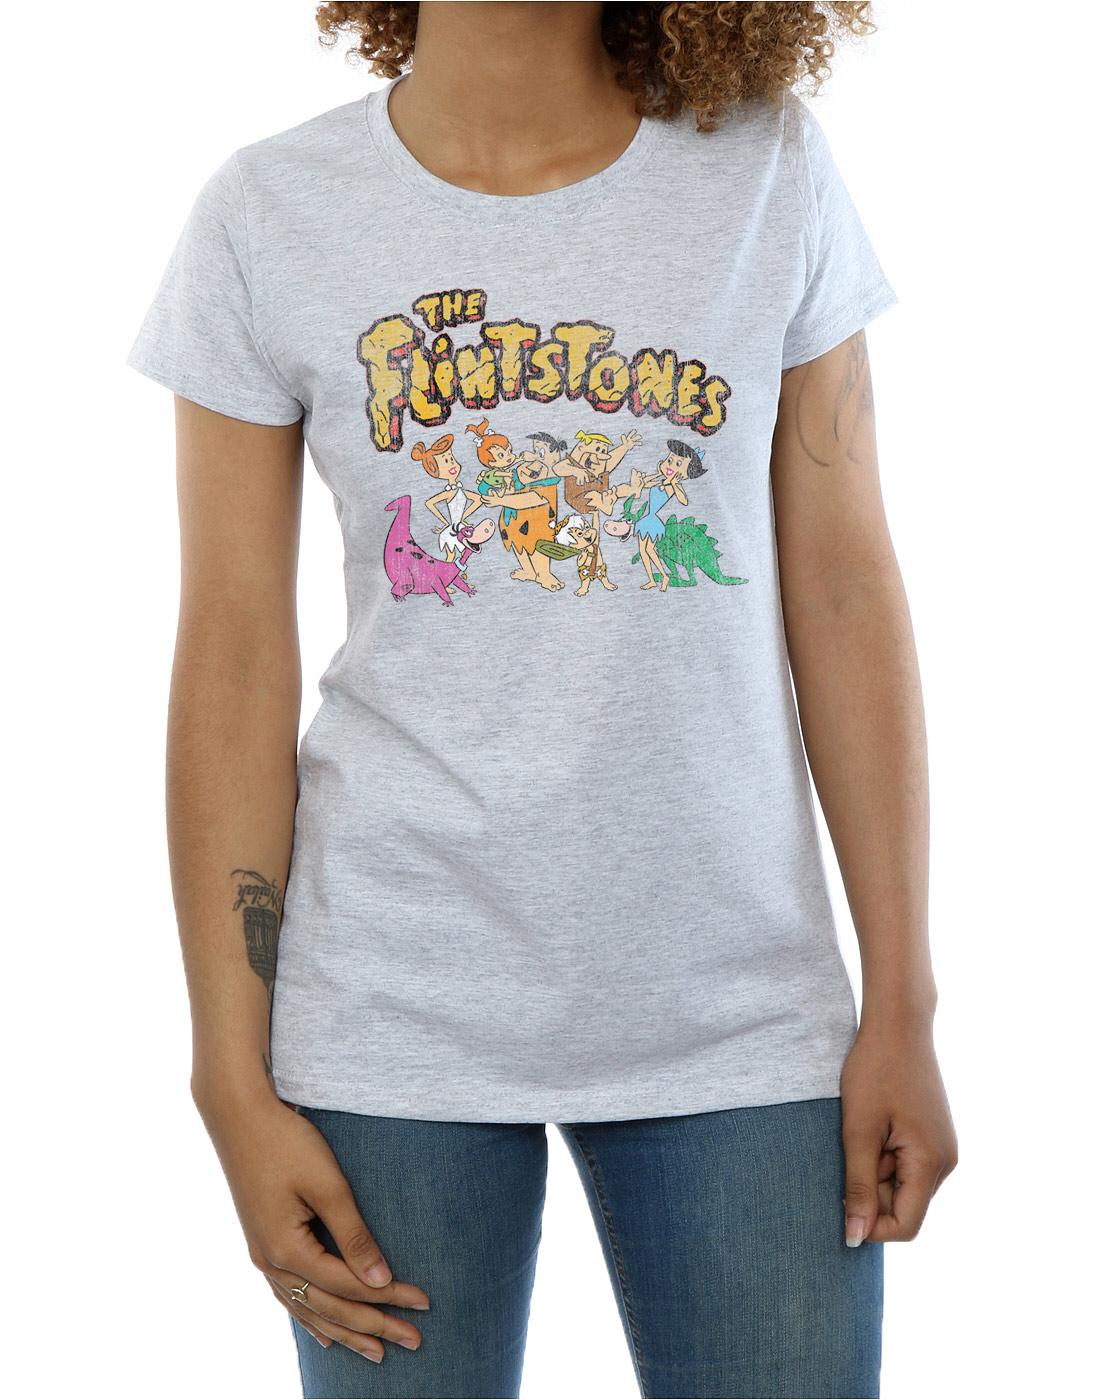 The-Flintstones-Women-039-s-Group-Distressed-T-Shirt thumbnail 14